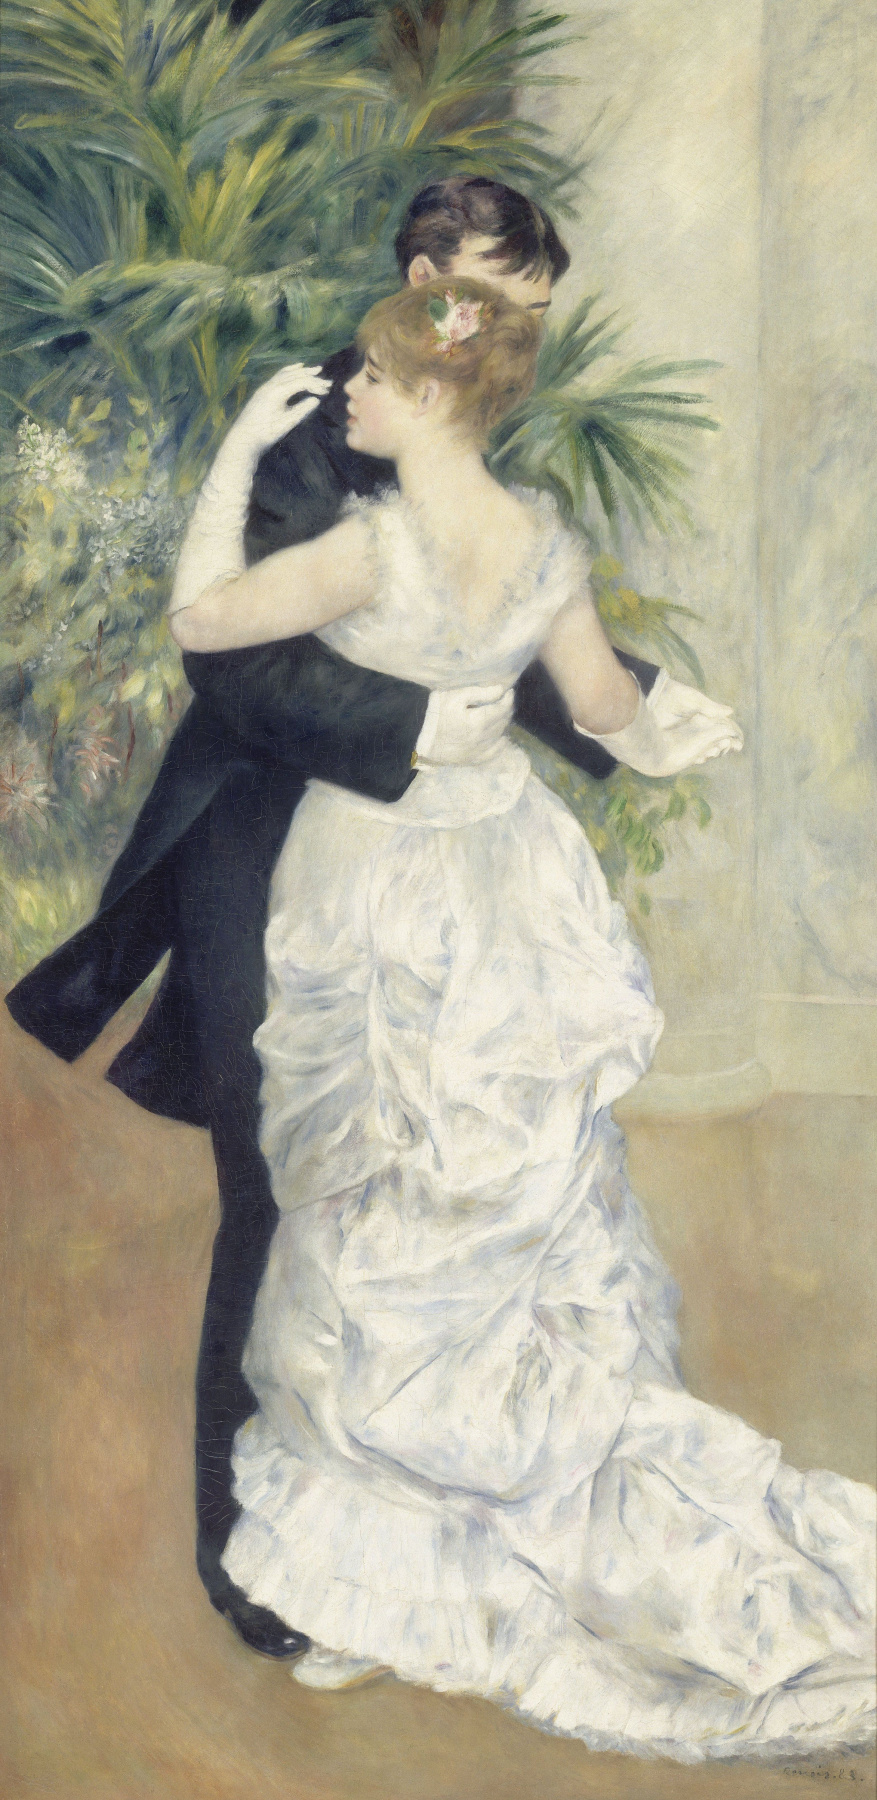 Пьер Огюст Ренуар. Танец в городе